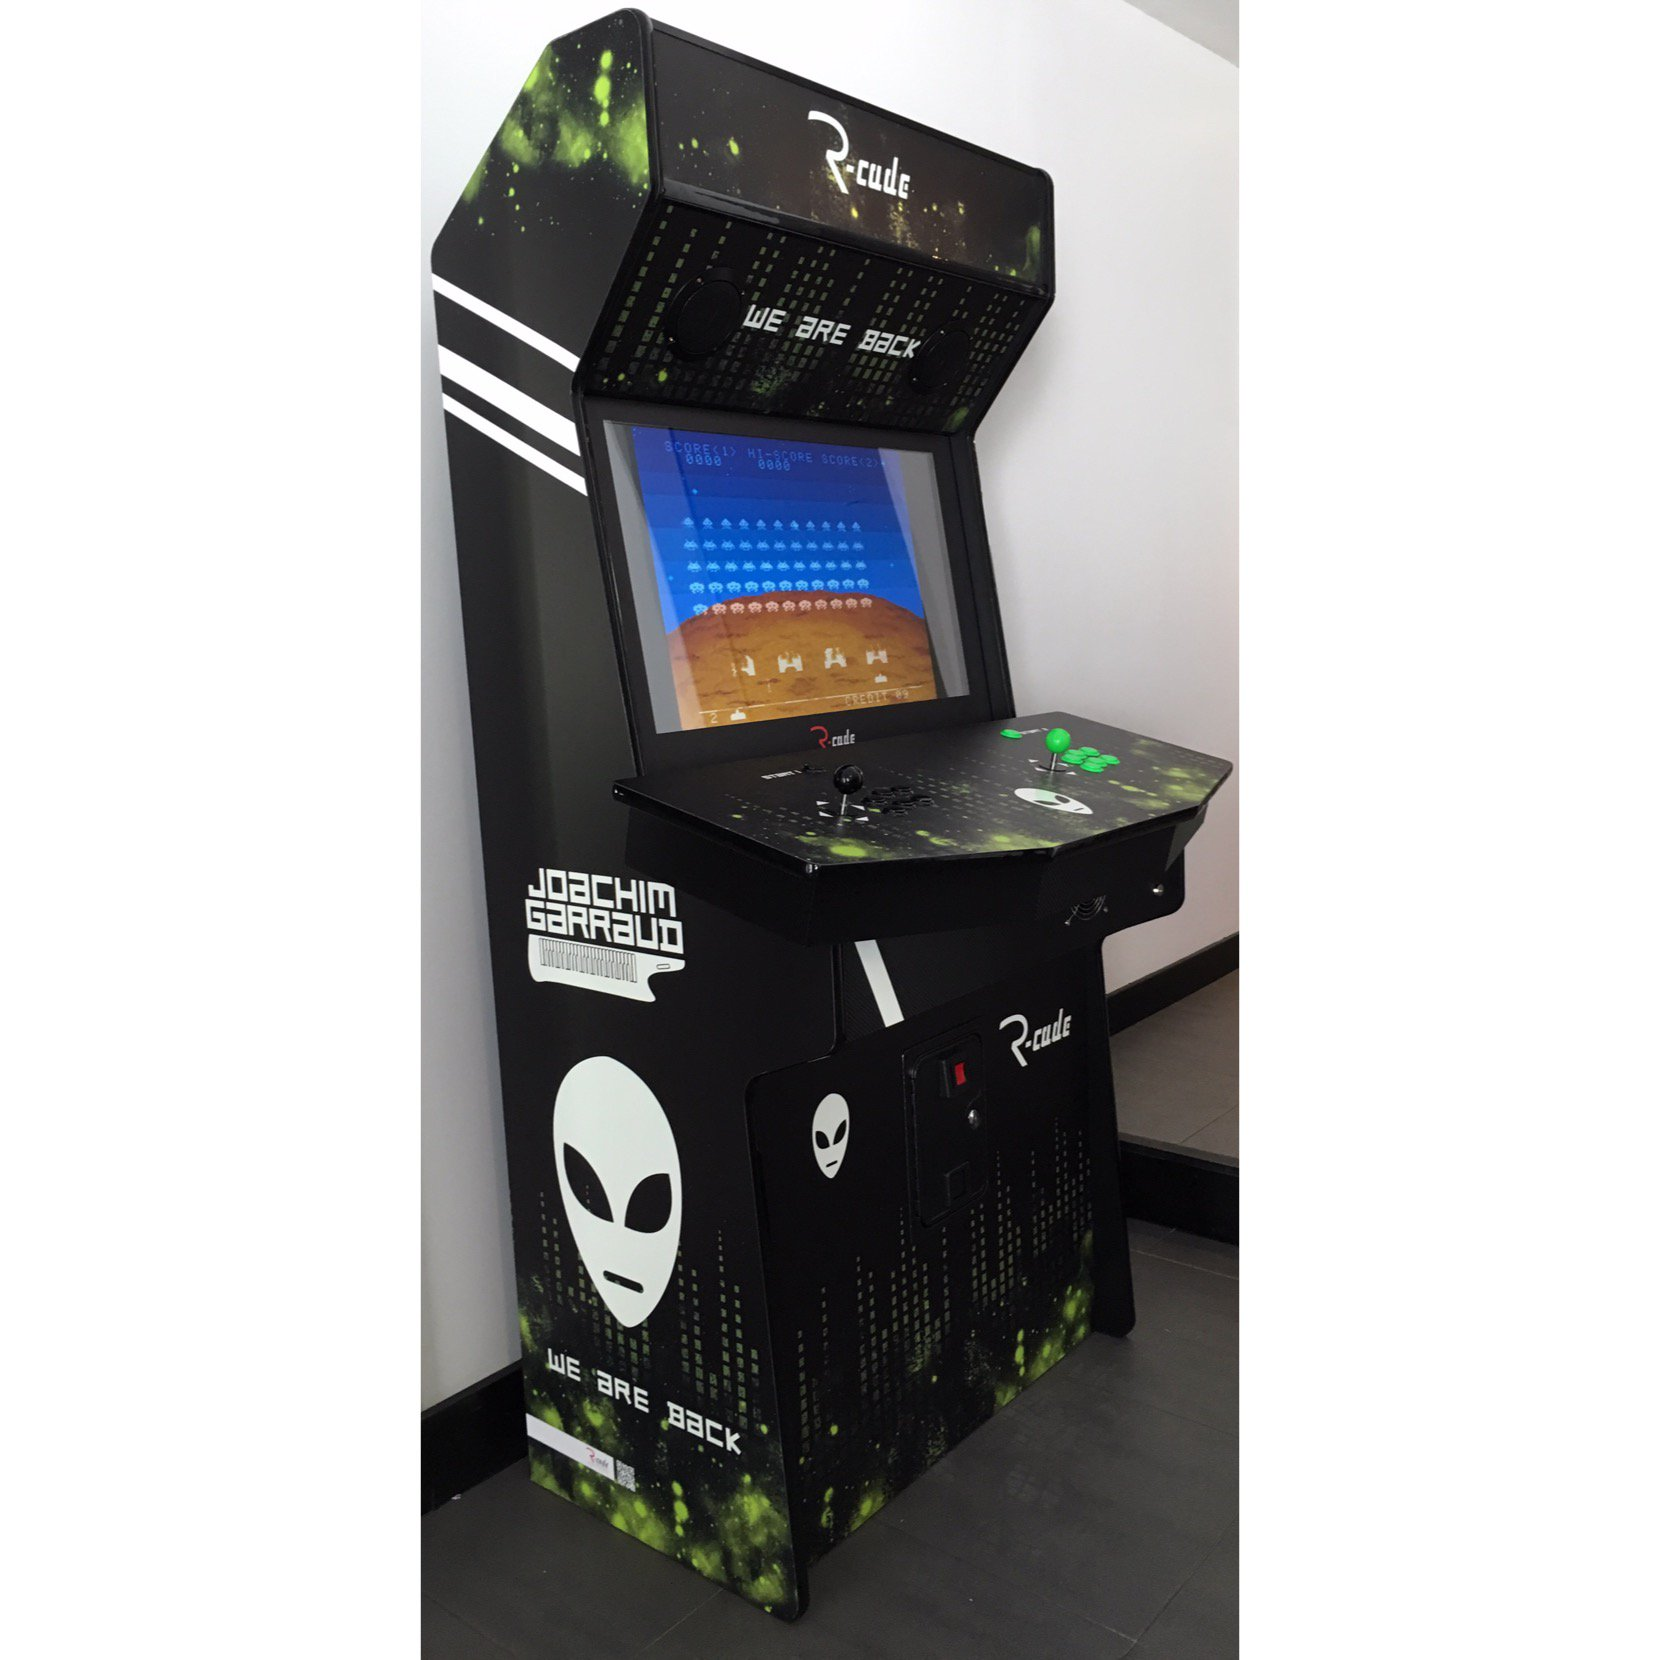 Borne d'arcade Garraud